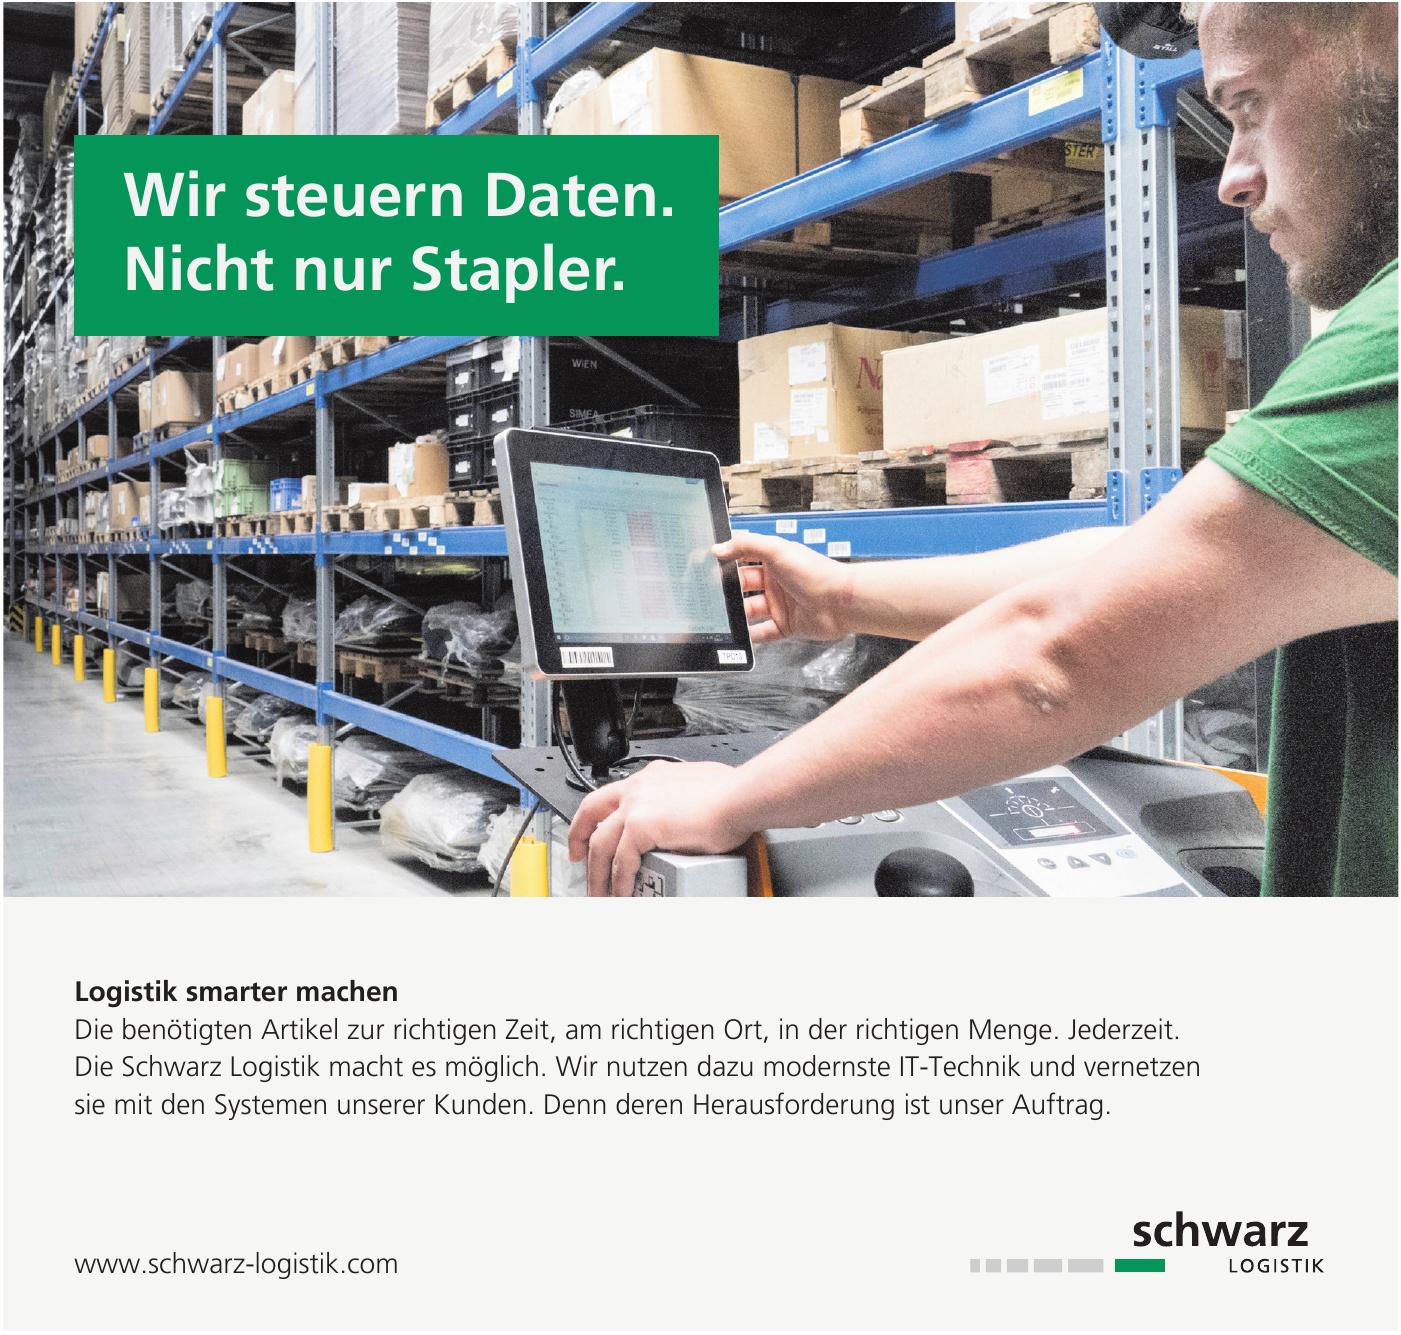 Schwarz Logistik